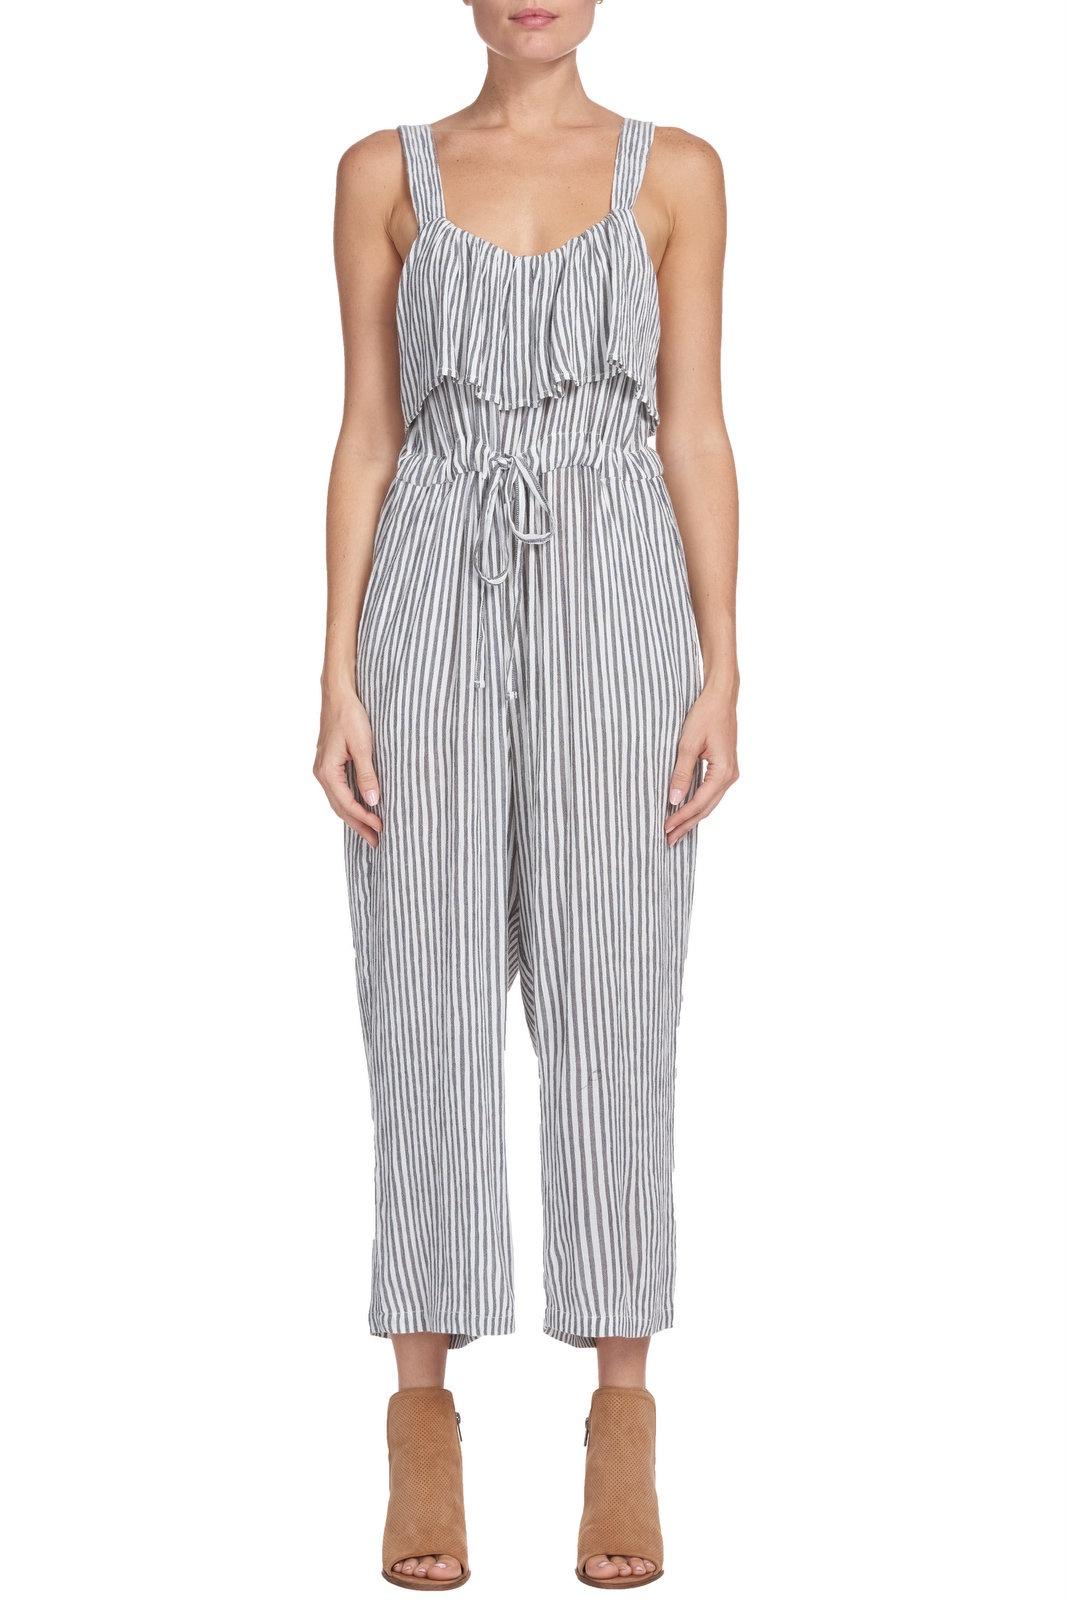 Char/Wht Stripe Jumpsuit w Ruffle Top